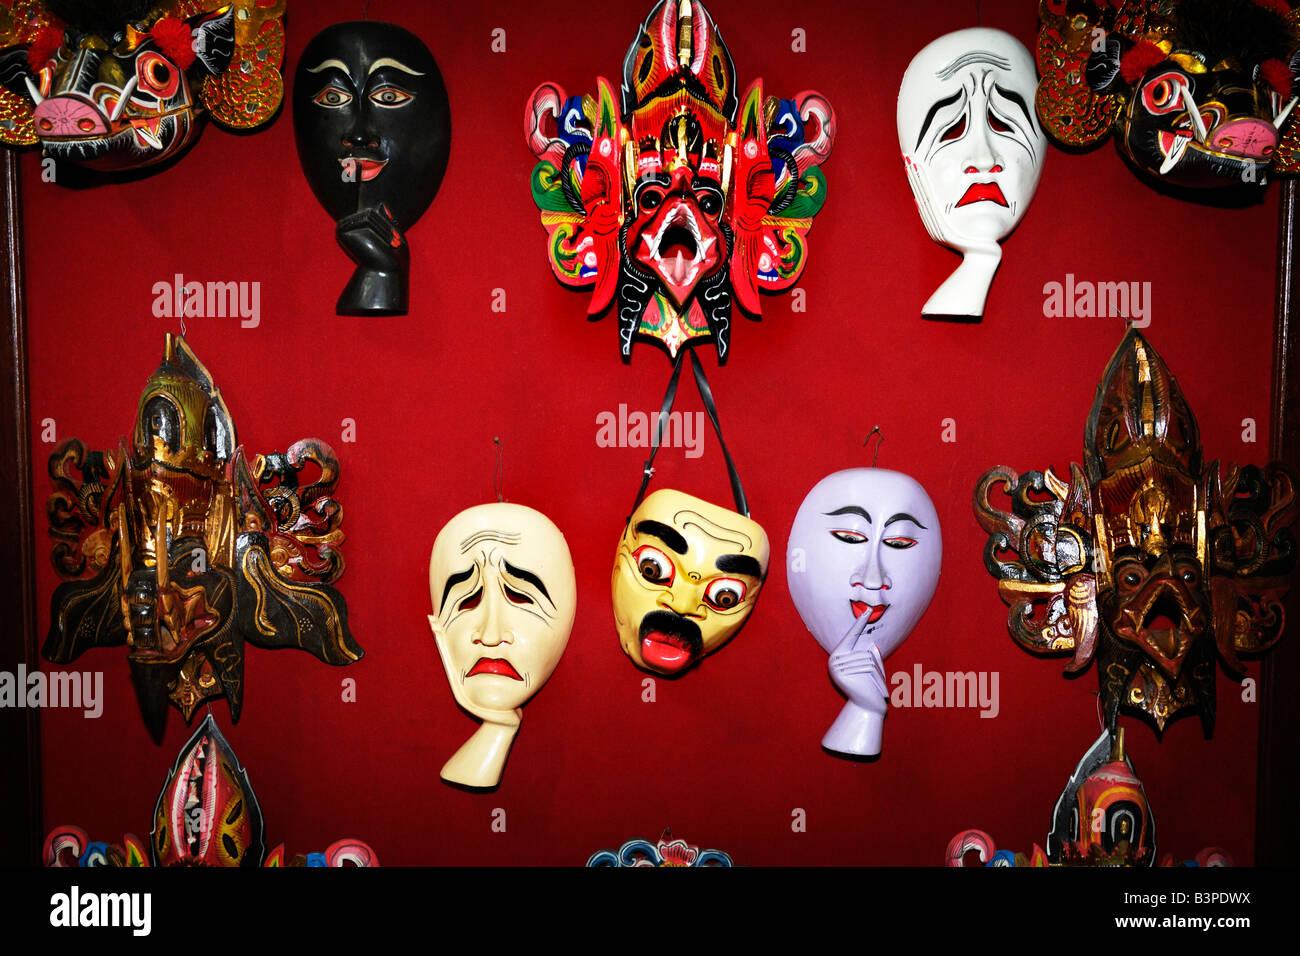 Balinese masks, Bali, Indonesia - Stock Image